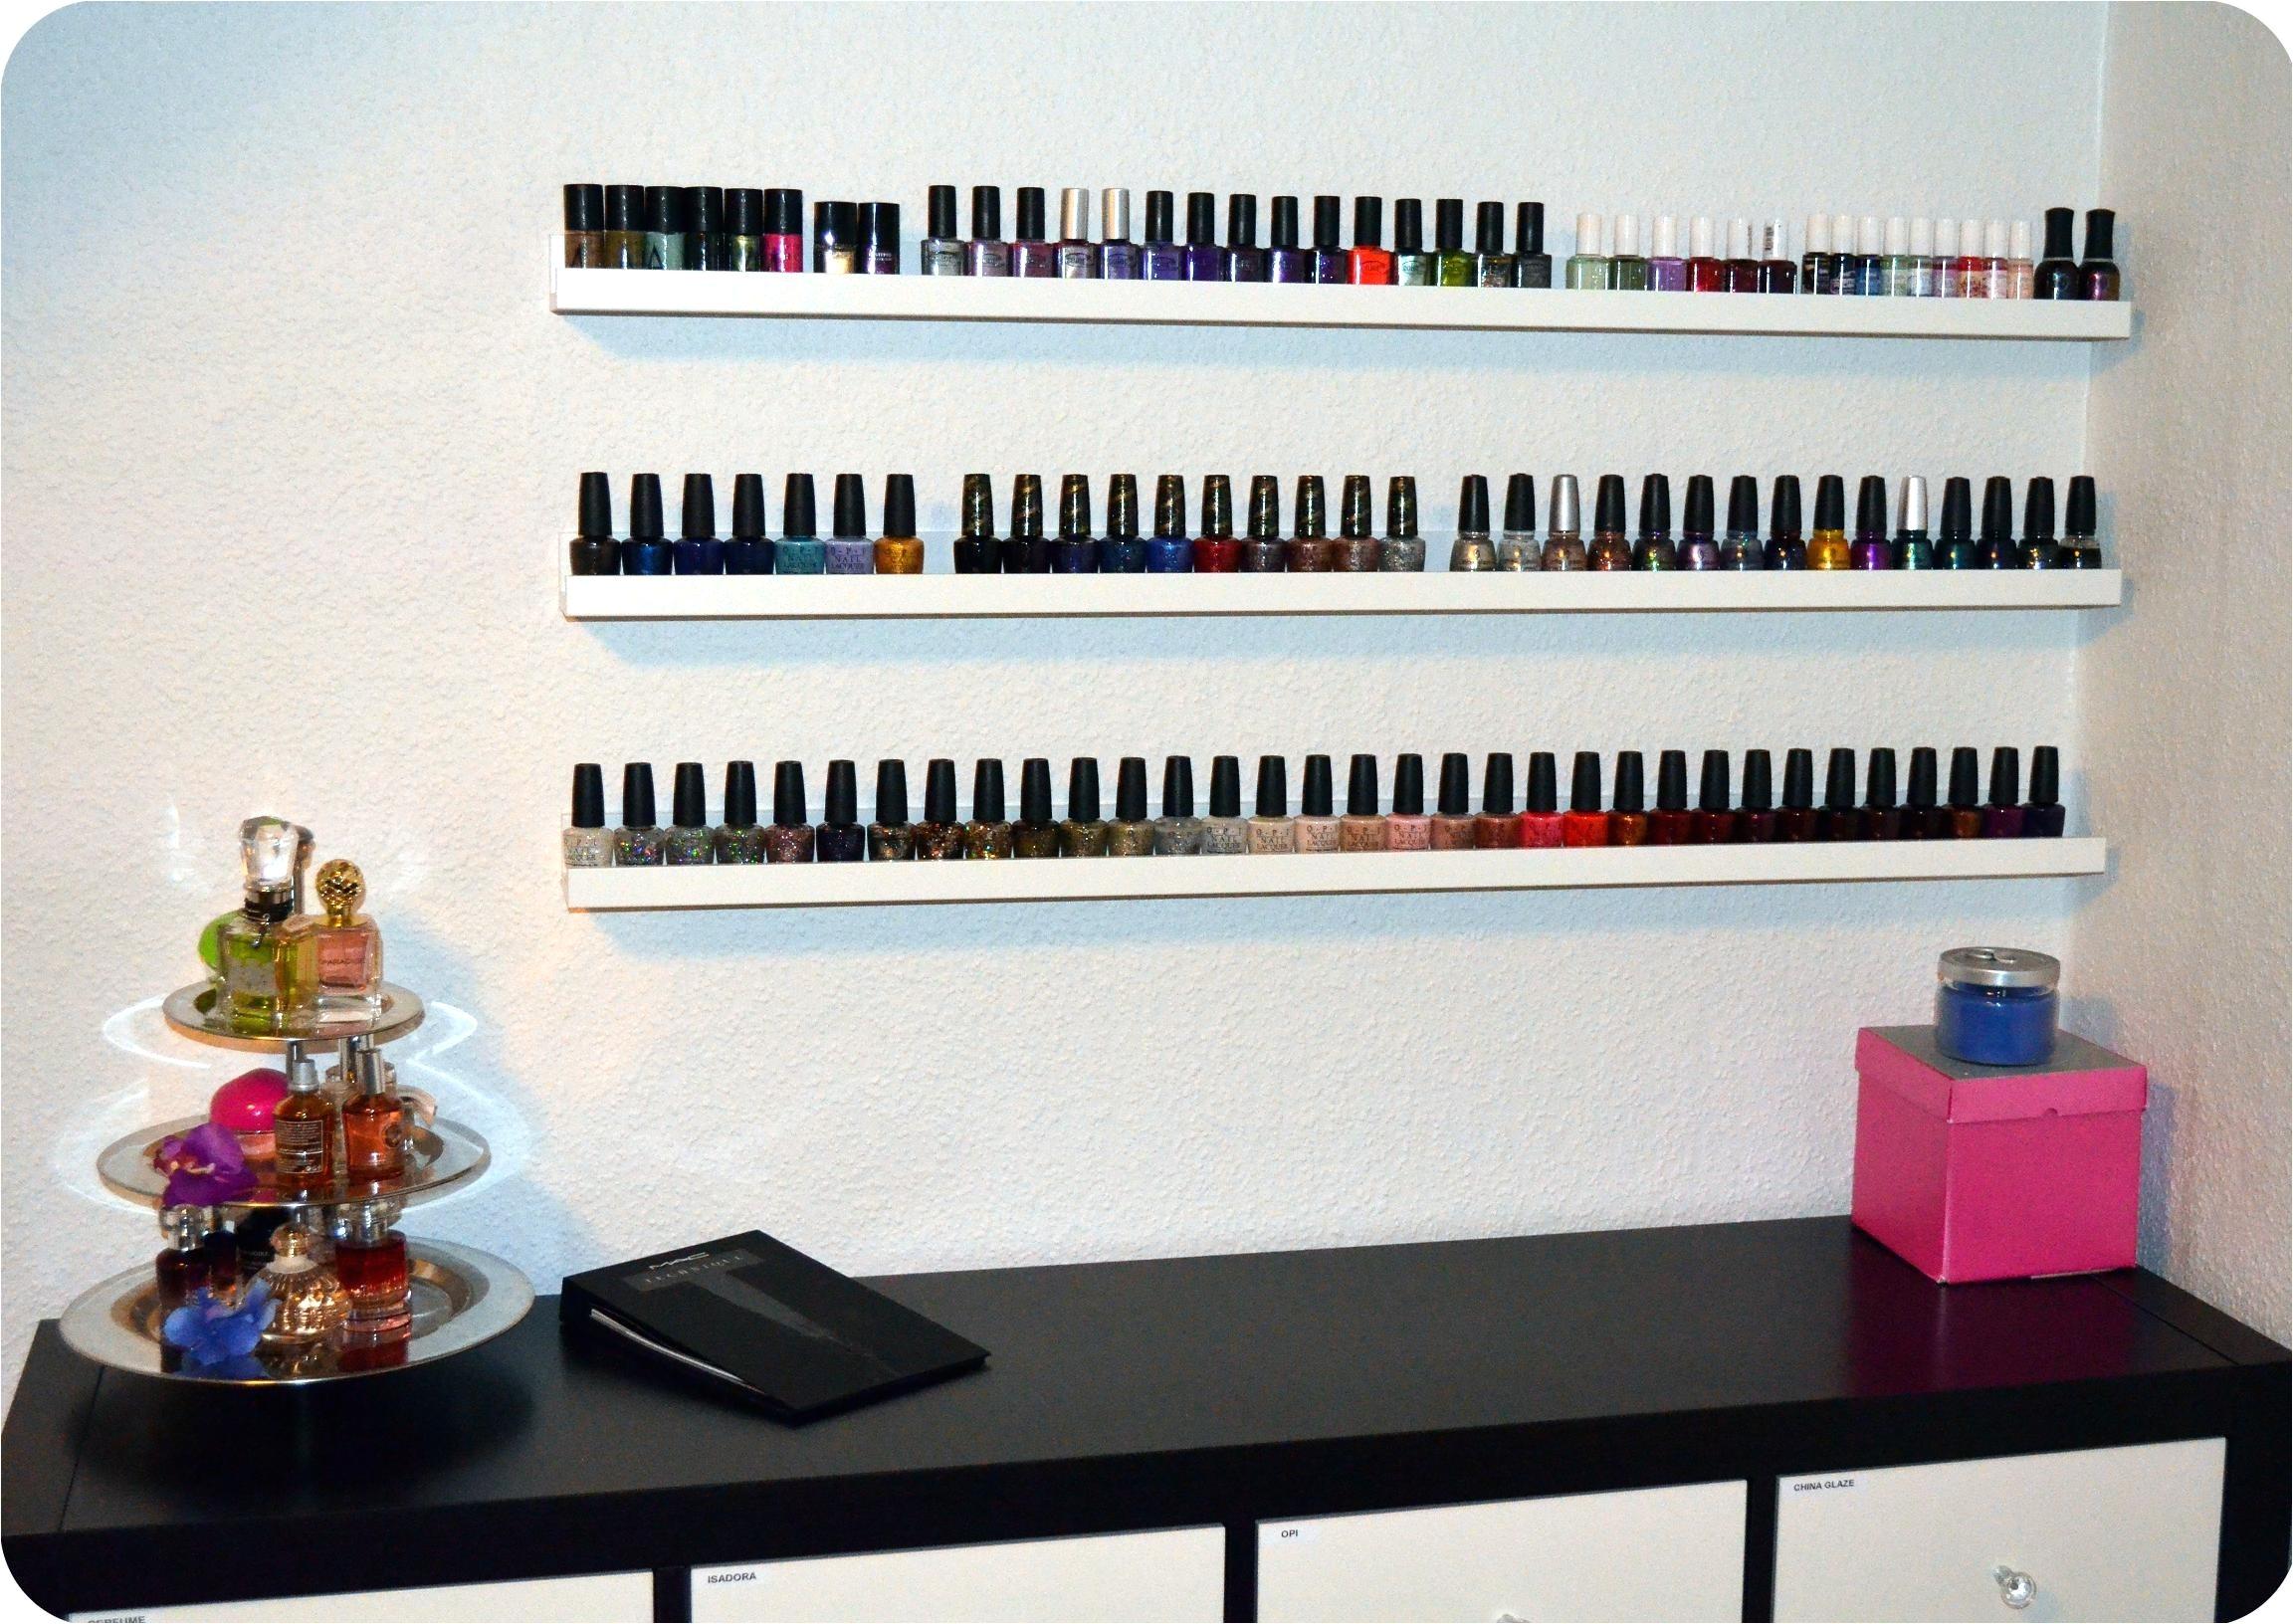 hwzwwau apartment essentials nail polish bruised knuckles essentials from nagellack rack ikea